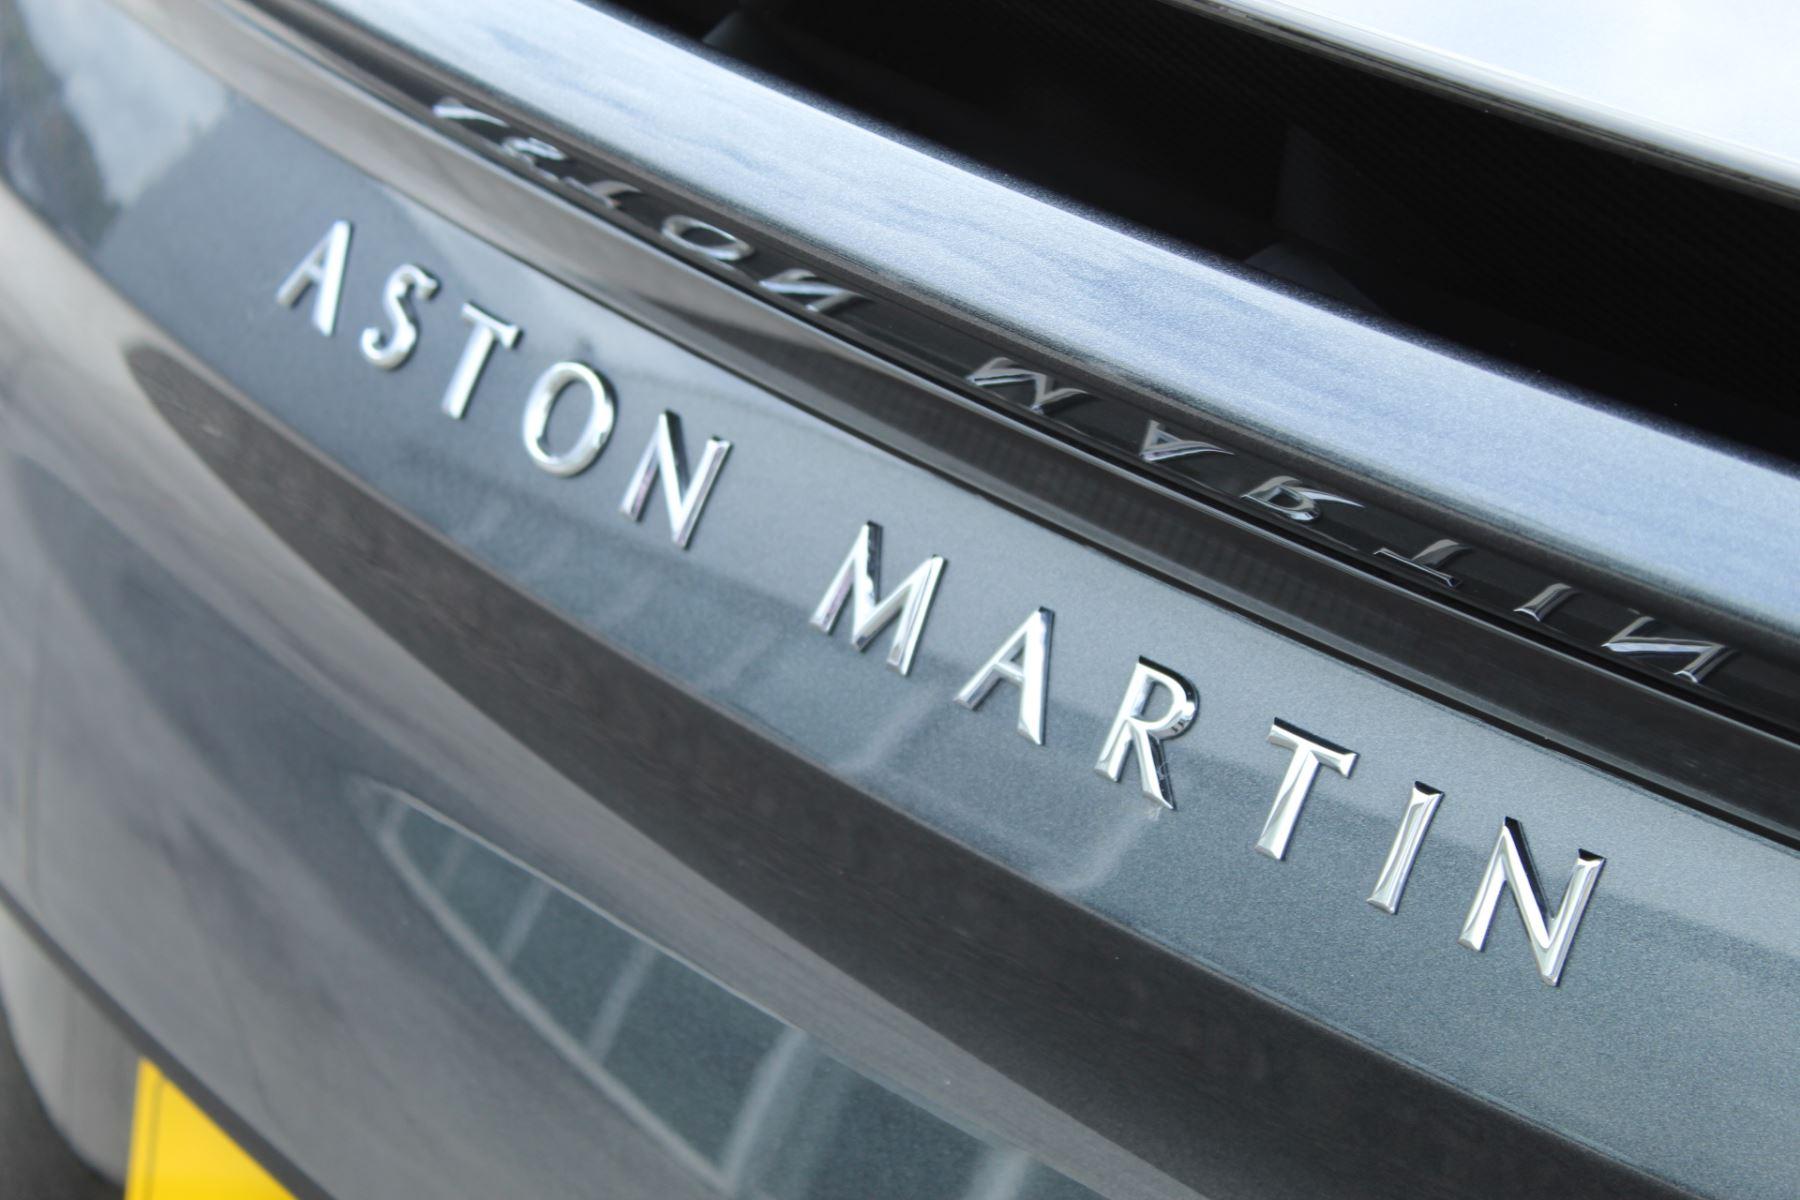 Aston Martin DBS V12 Superleggera 2dr Touchtronic image 38